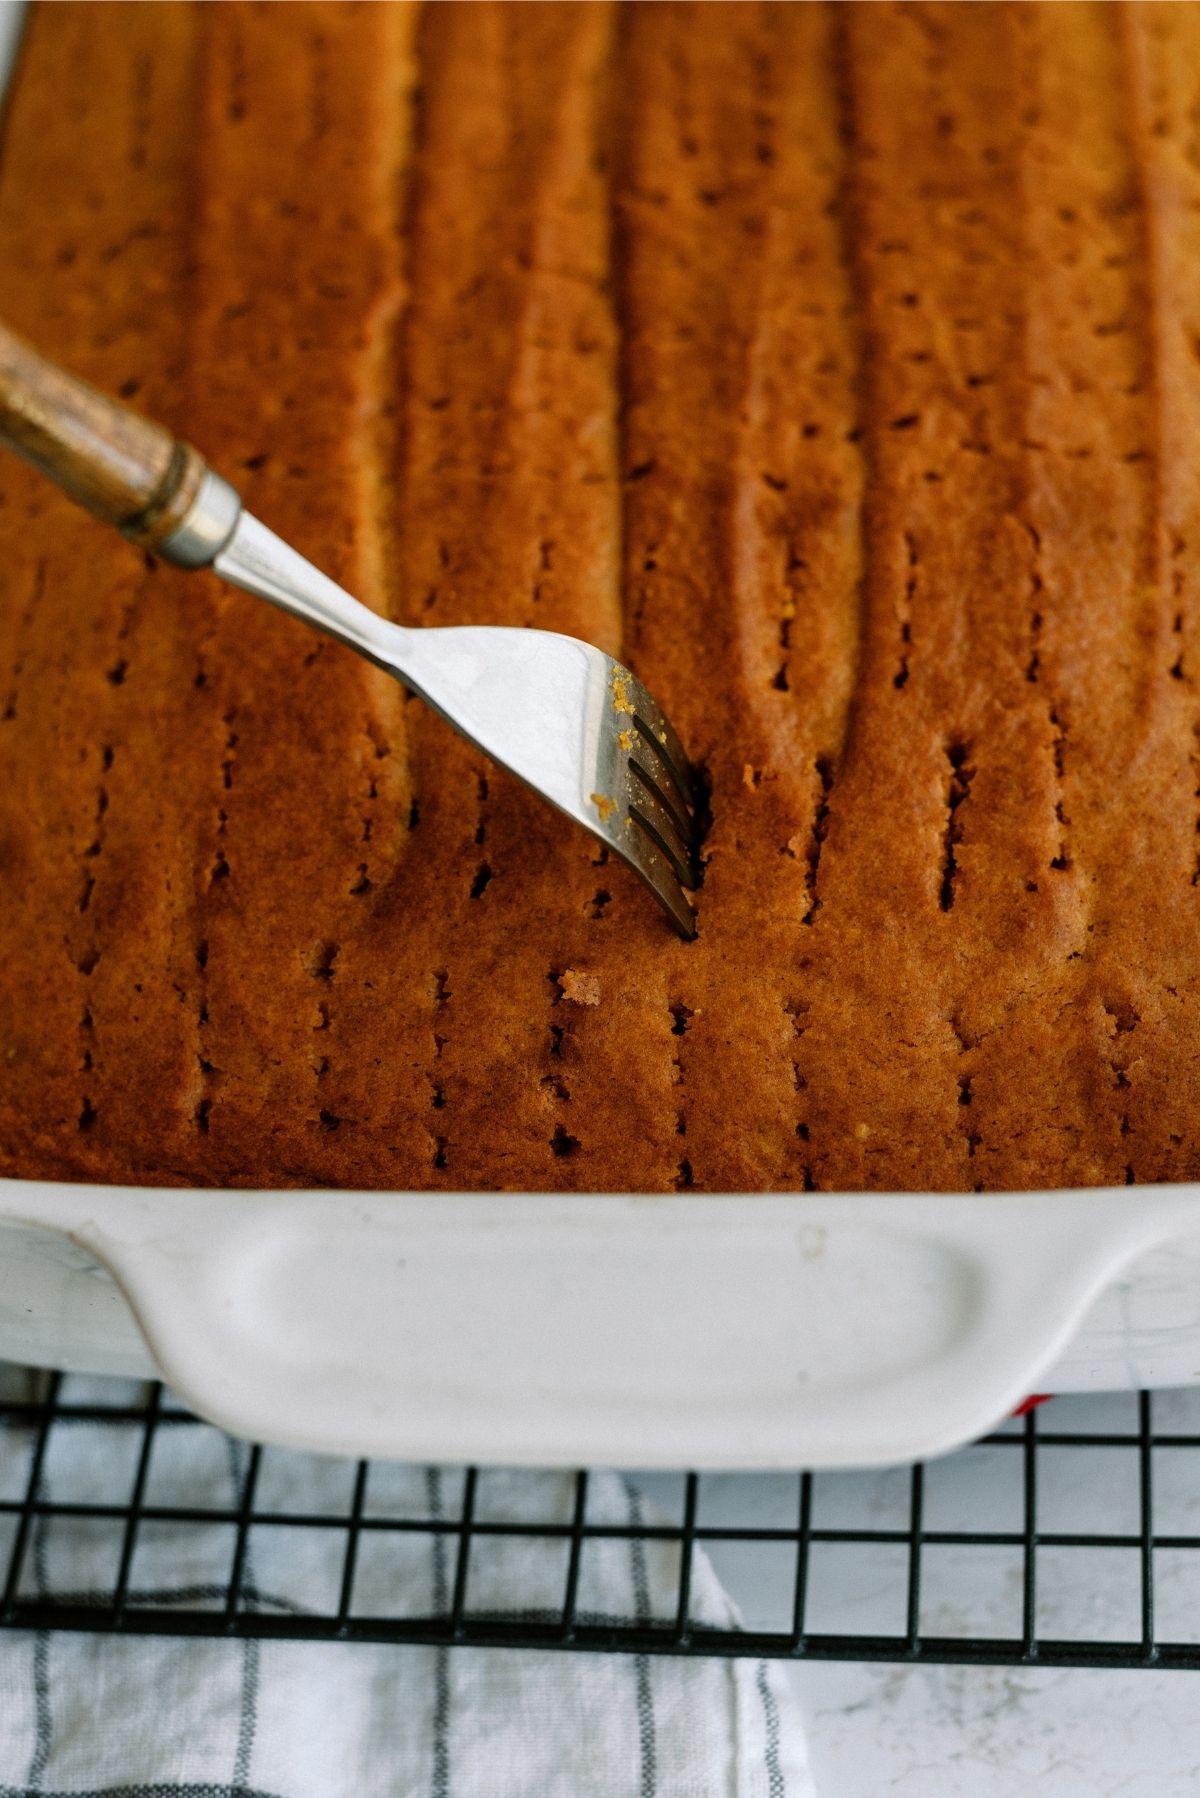 Fork poking holes in baked cake